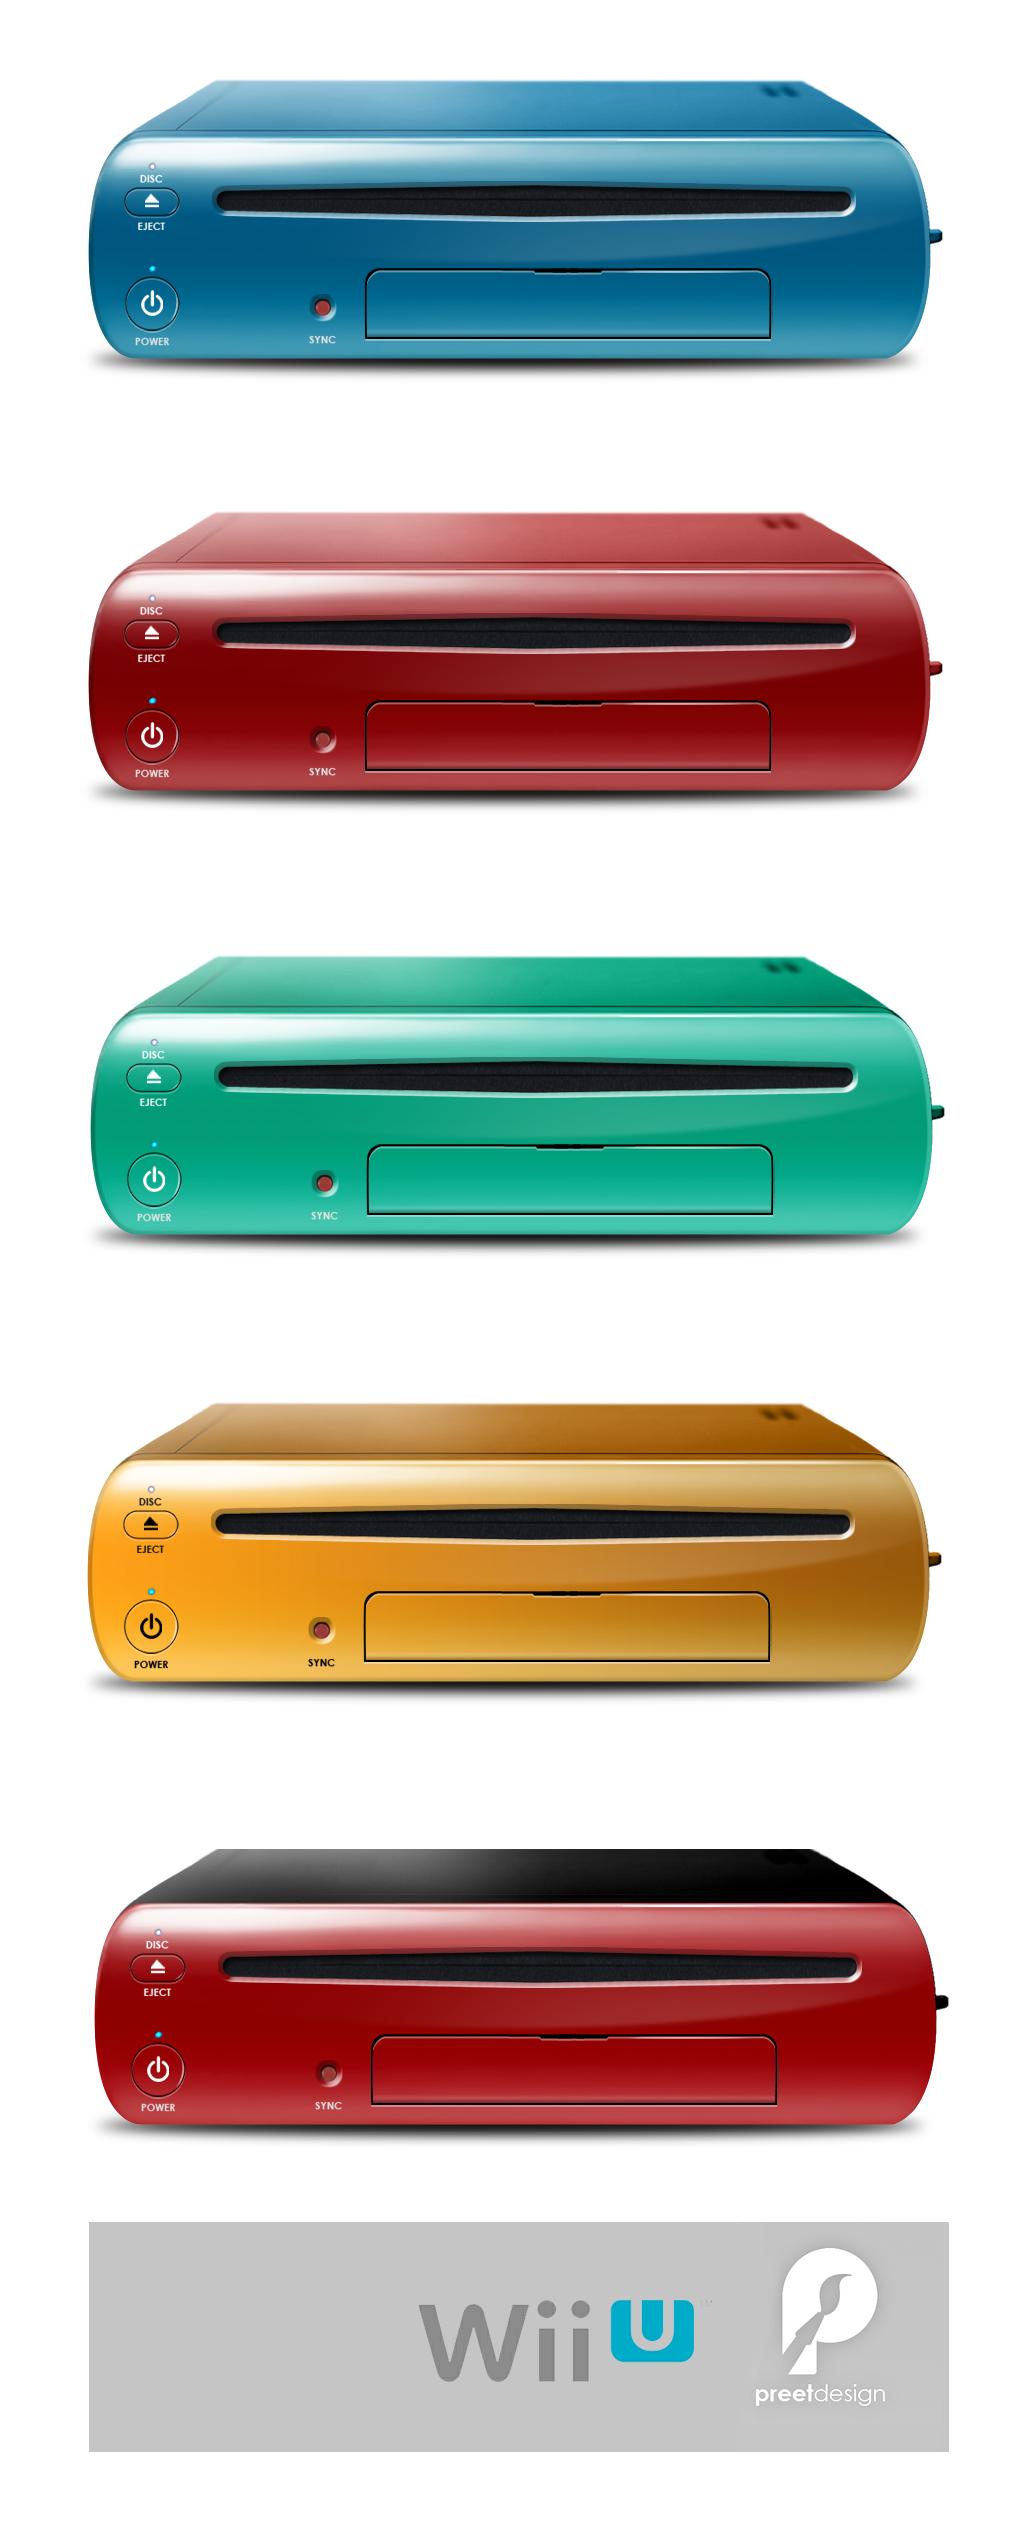 Wii U Colors by preetard